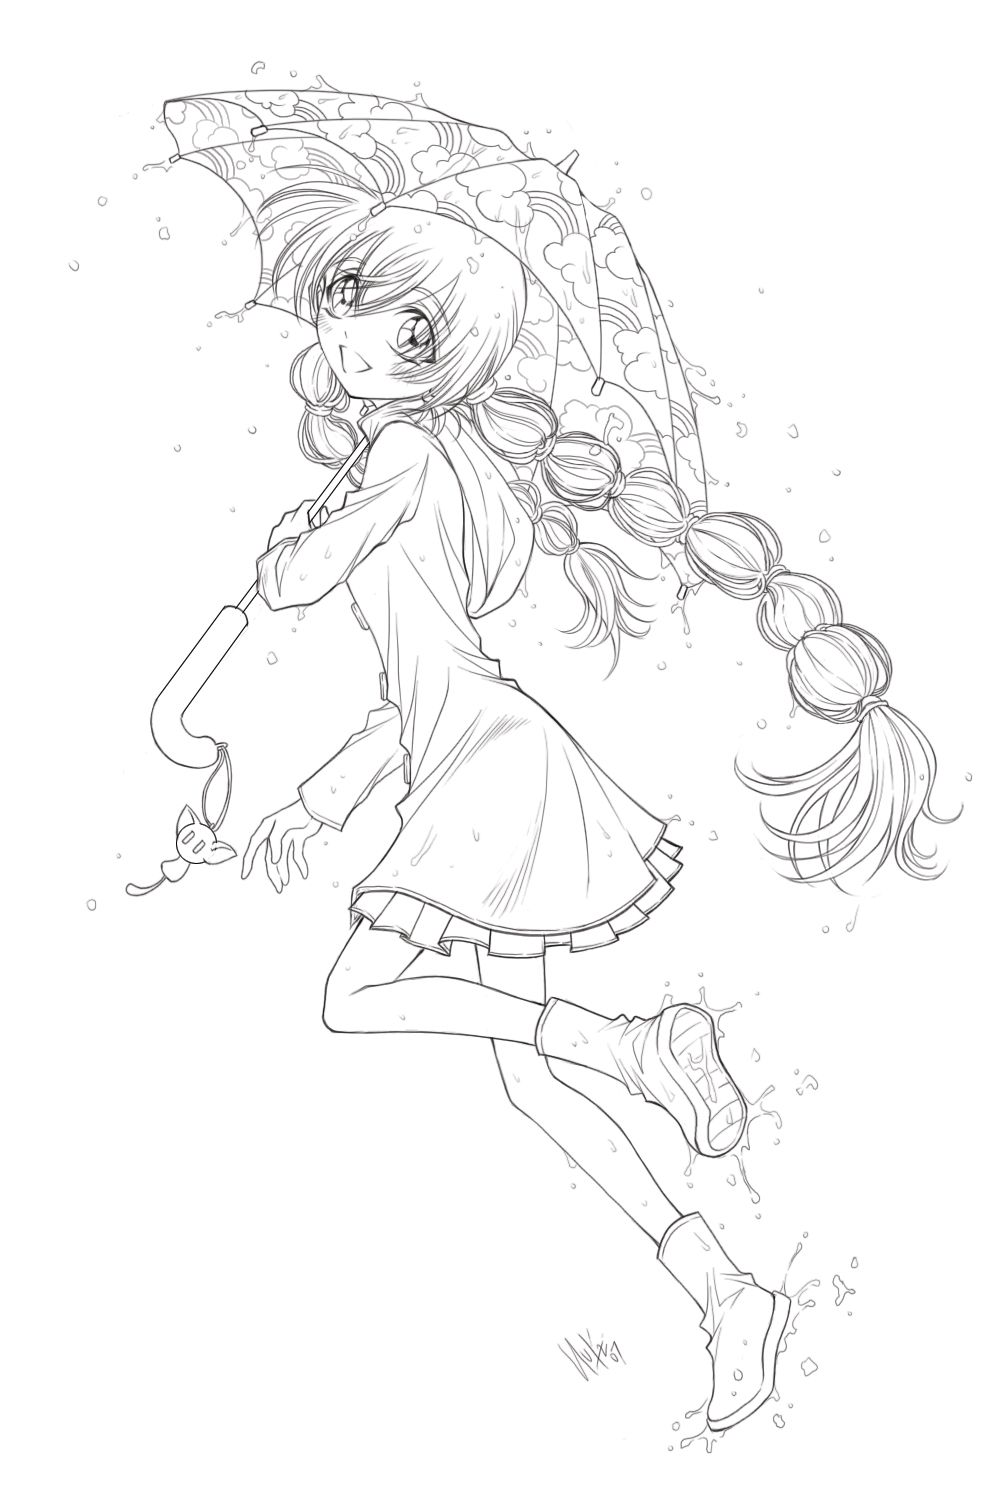 Umbrella girl by Sureya | LEGAL Digi Images | Pinterest | Girls ...